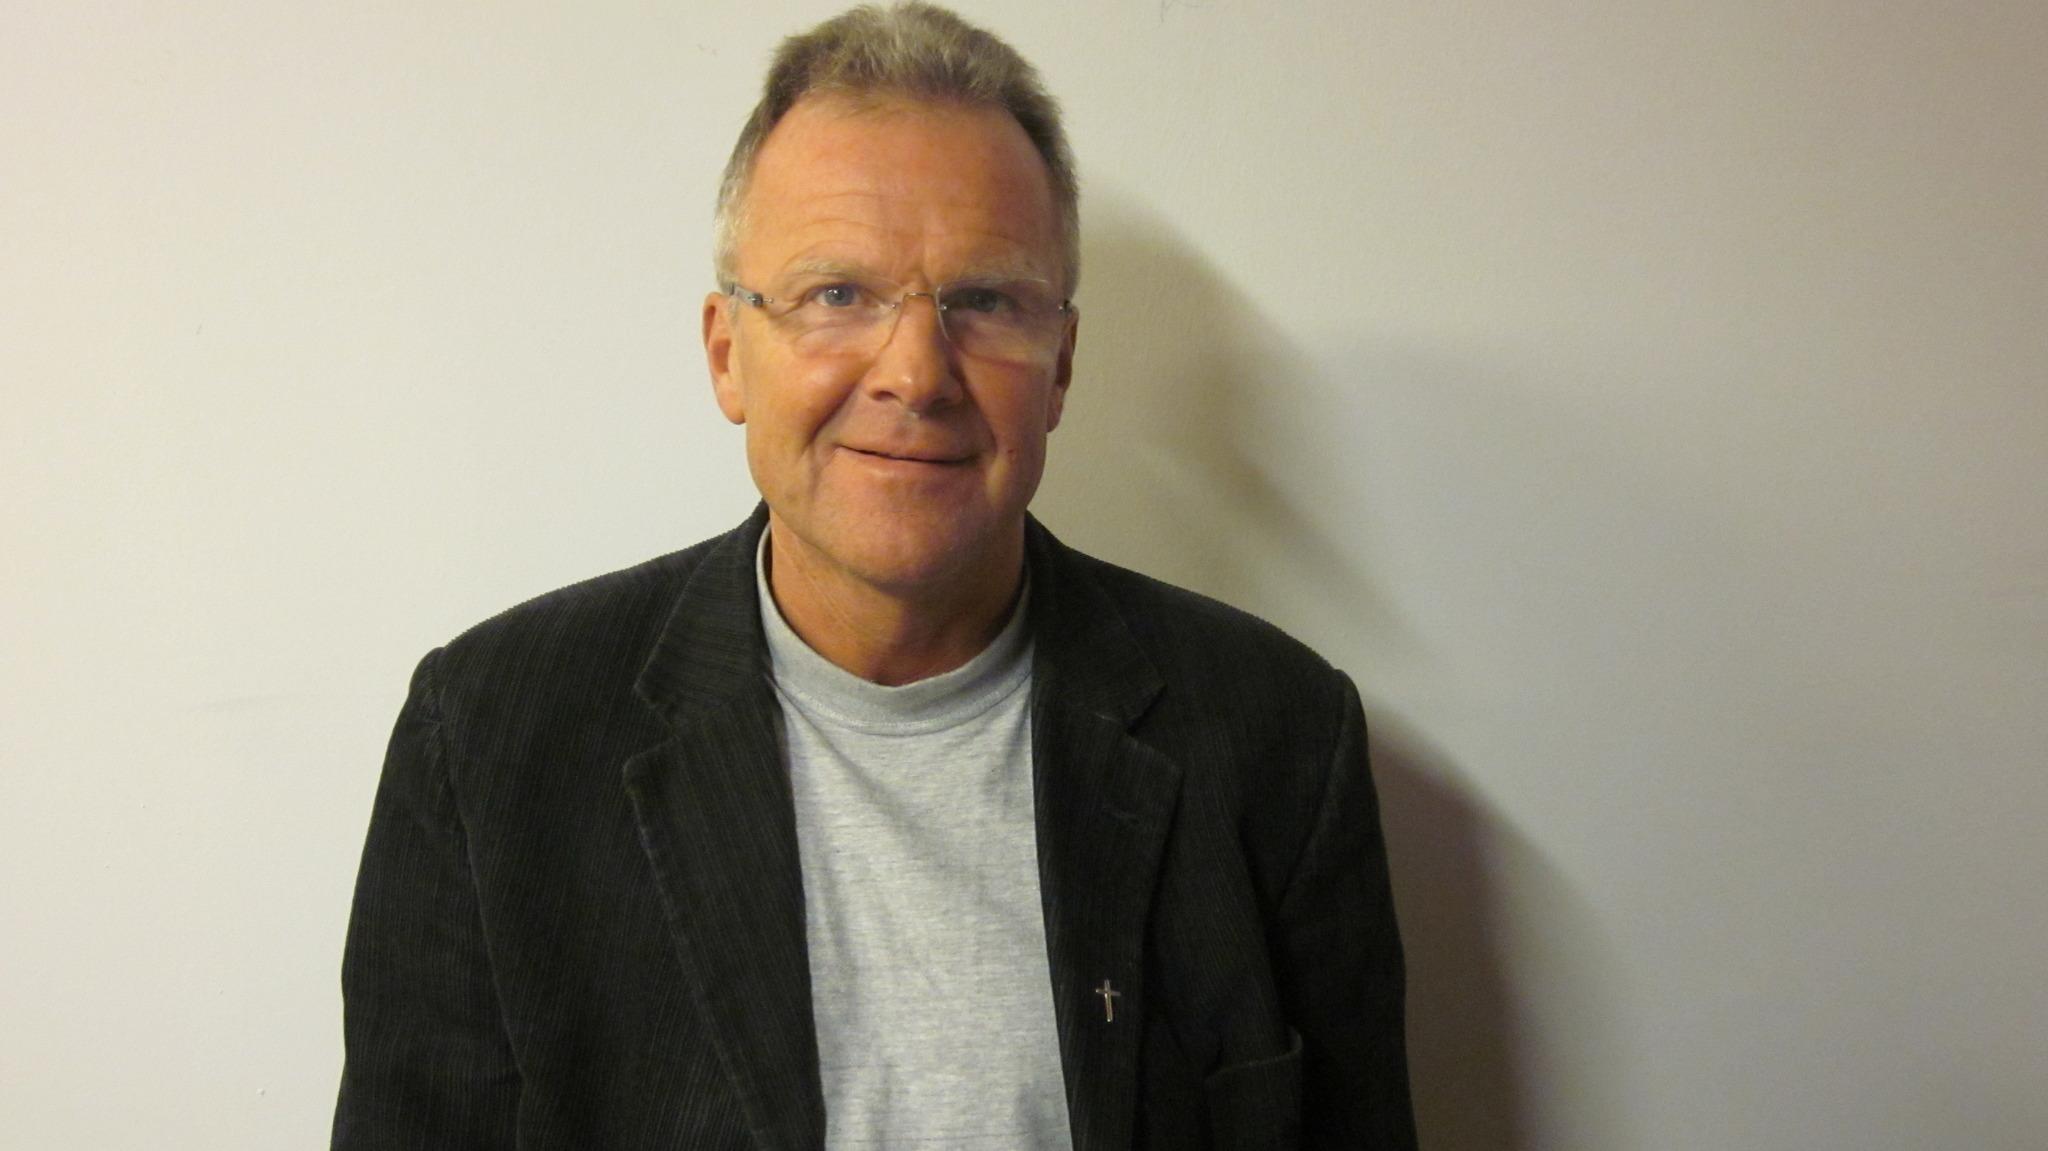 Georg Heil